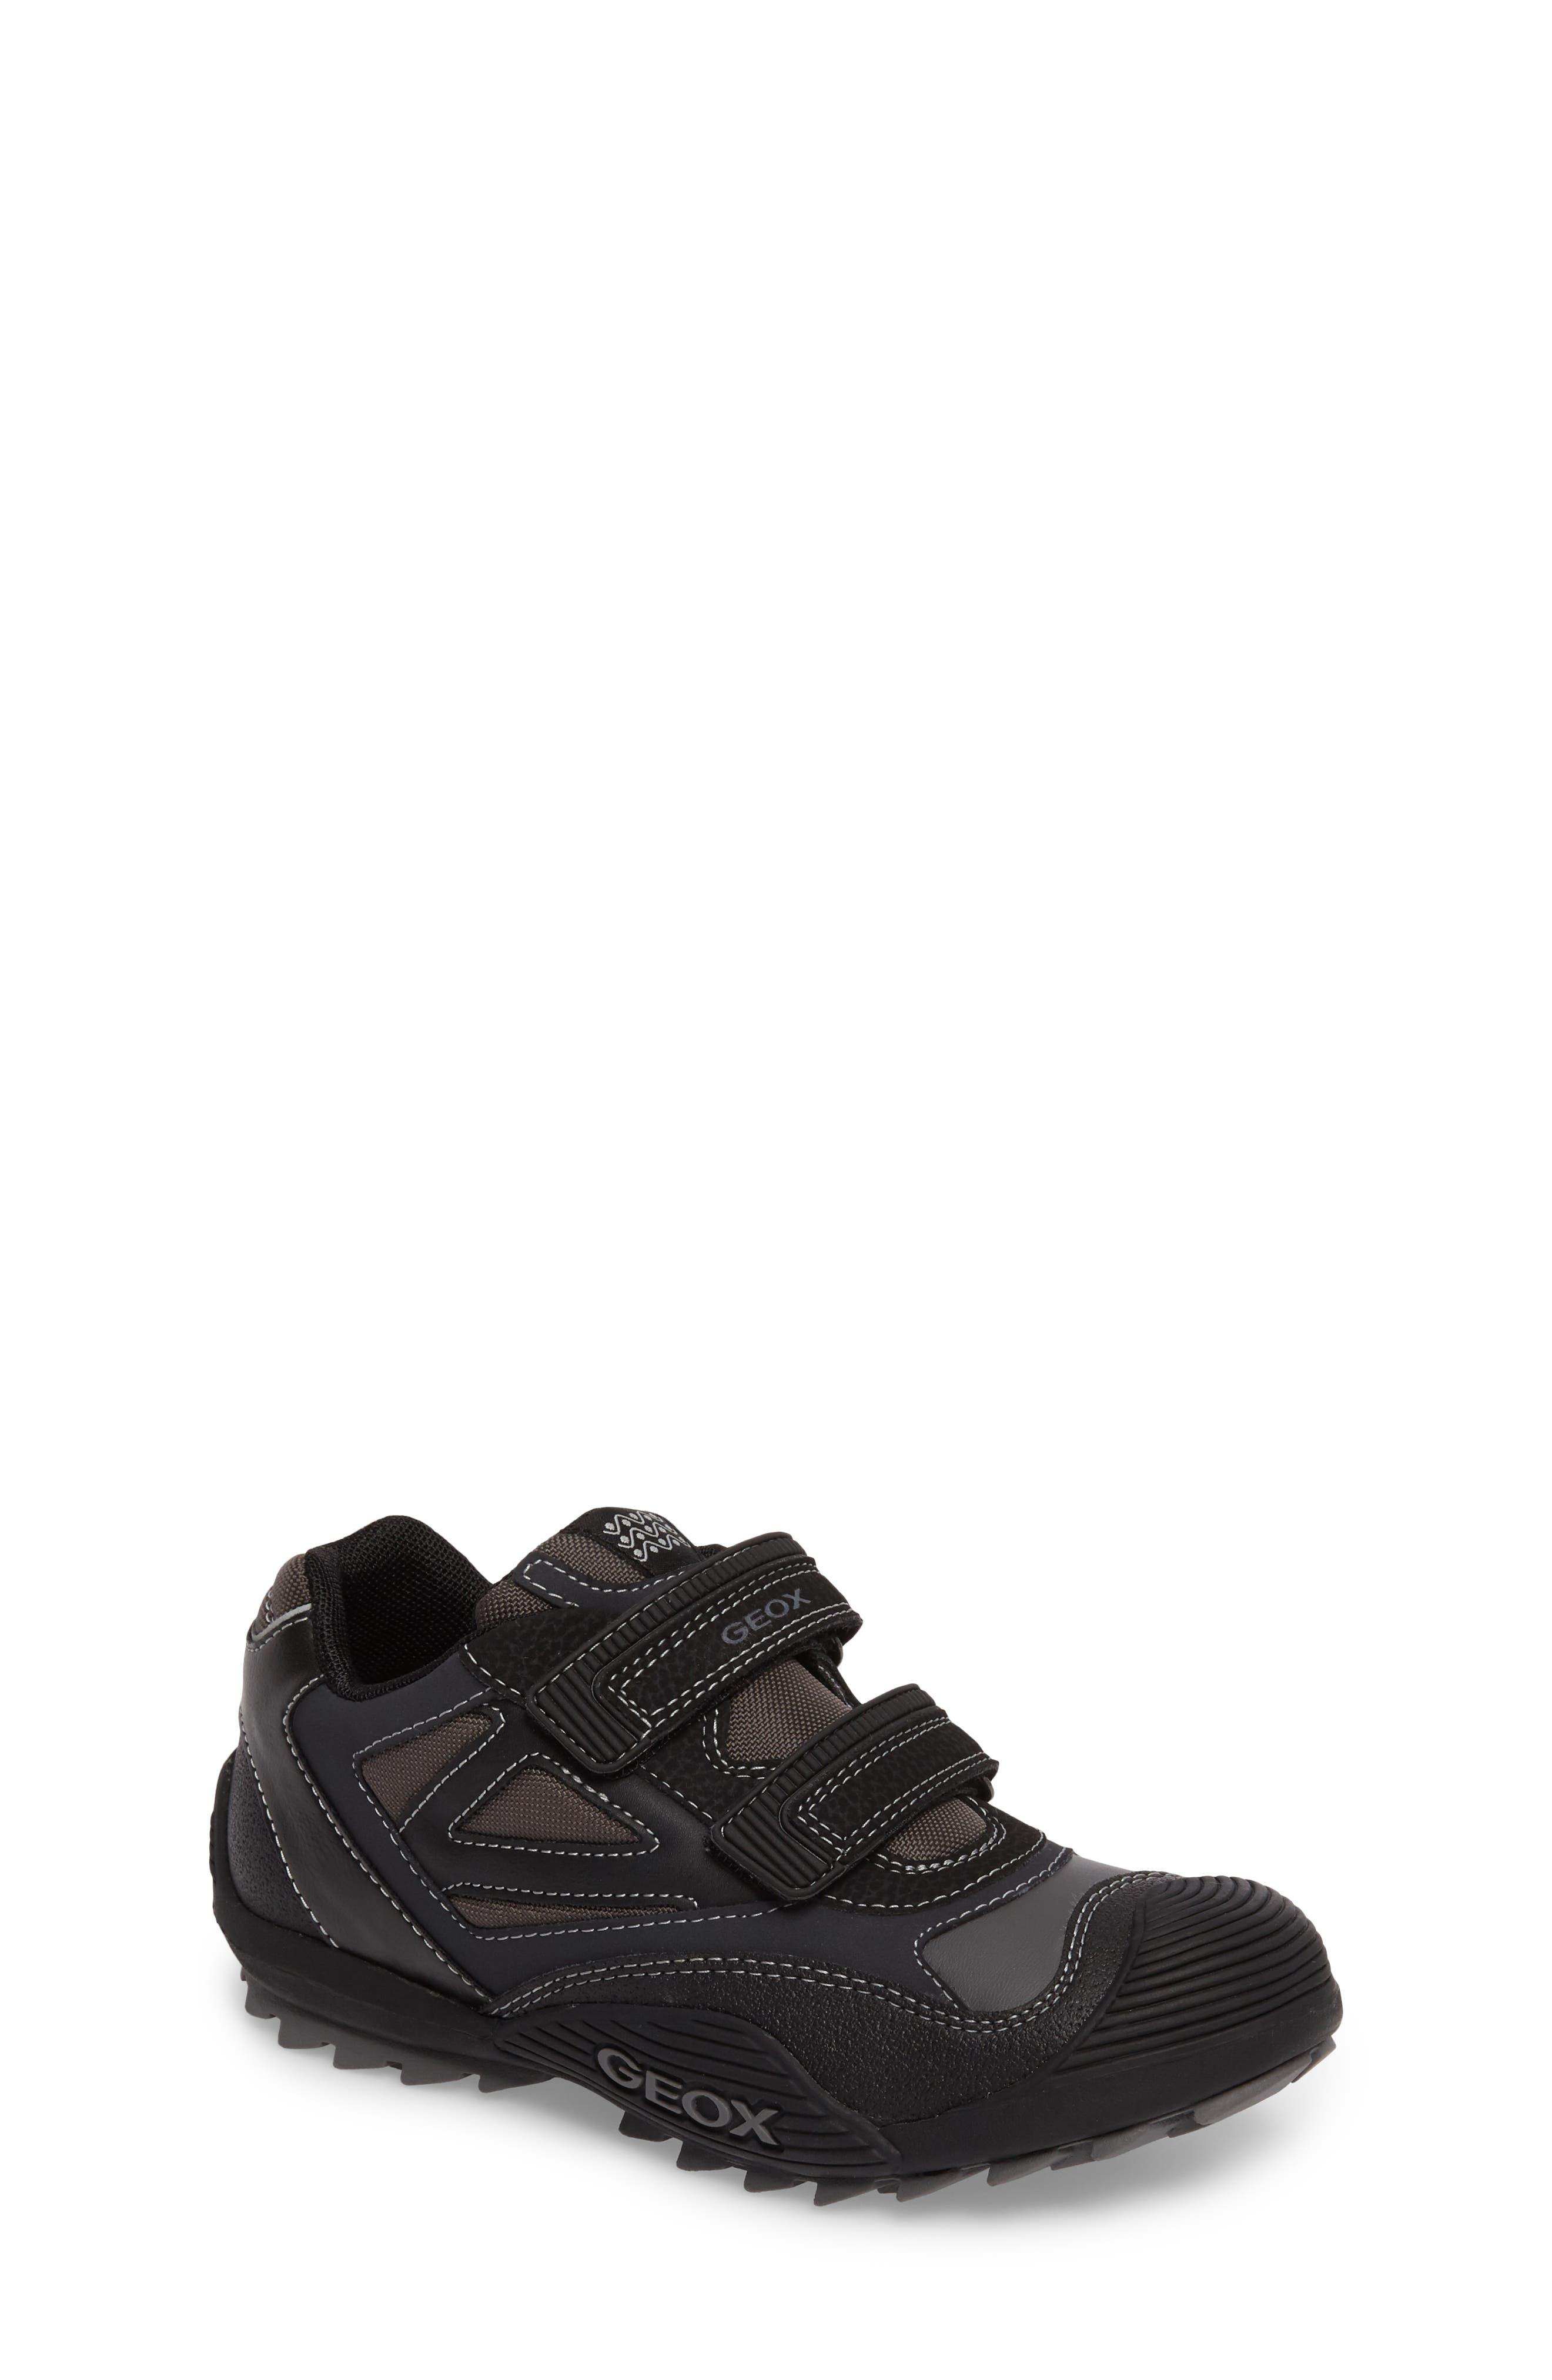 GEOX Savage Sneaker, Main, color, 002